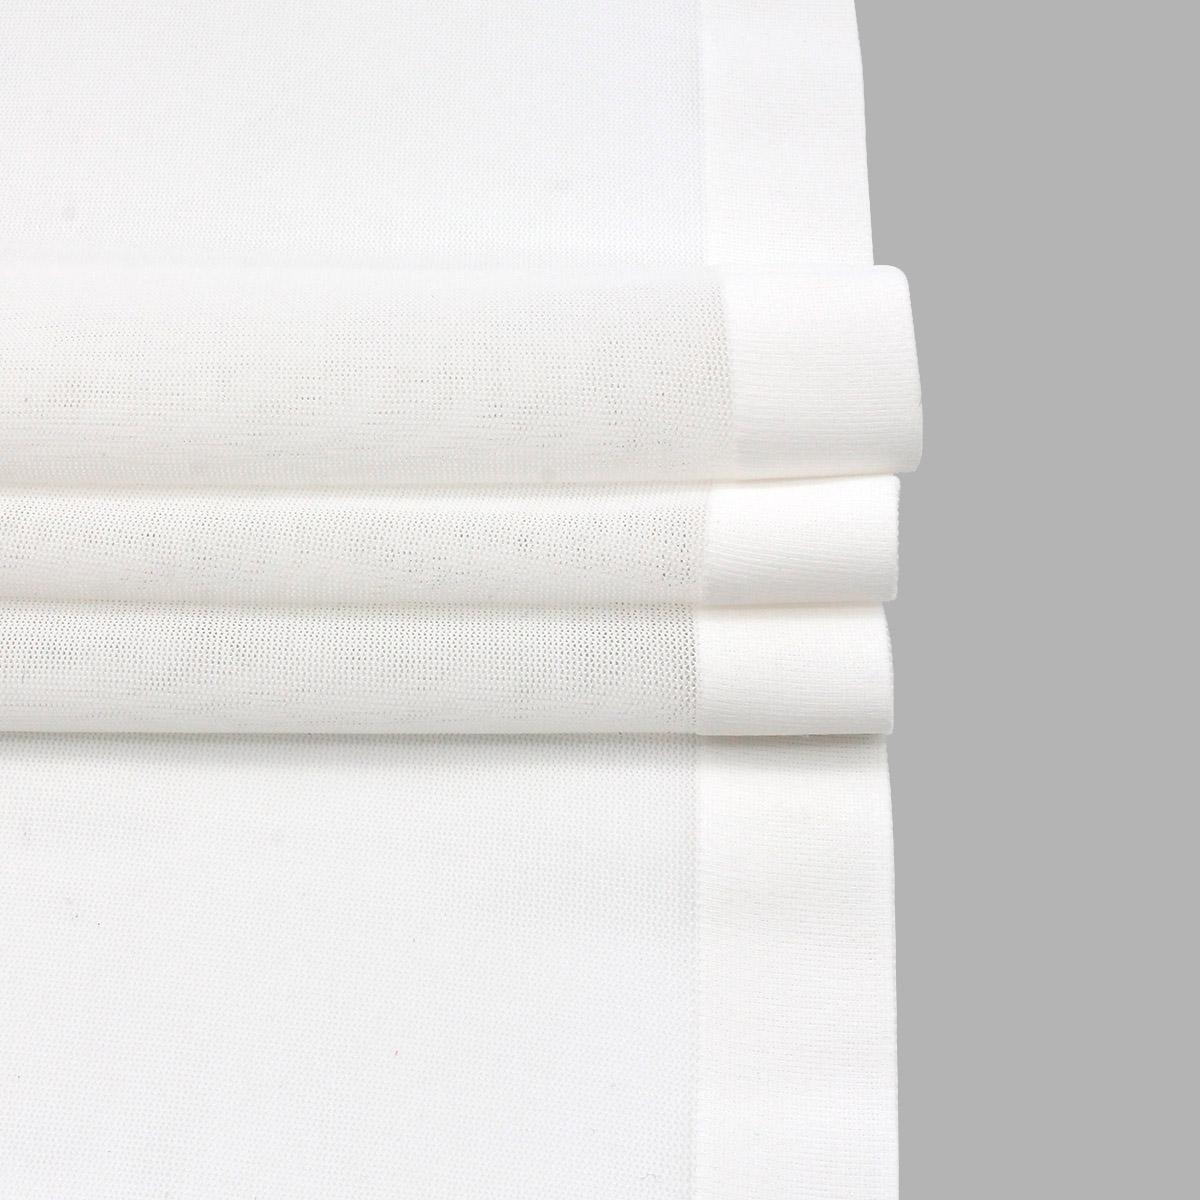 SU 77 Ткань эластичная бельевая 16 см*10